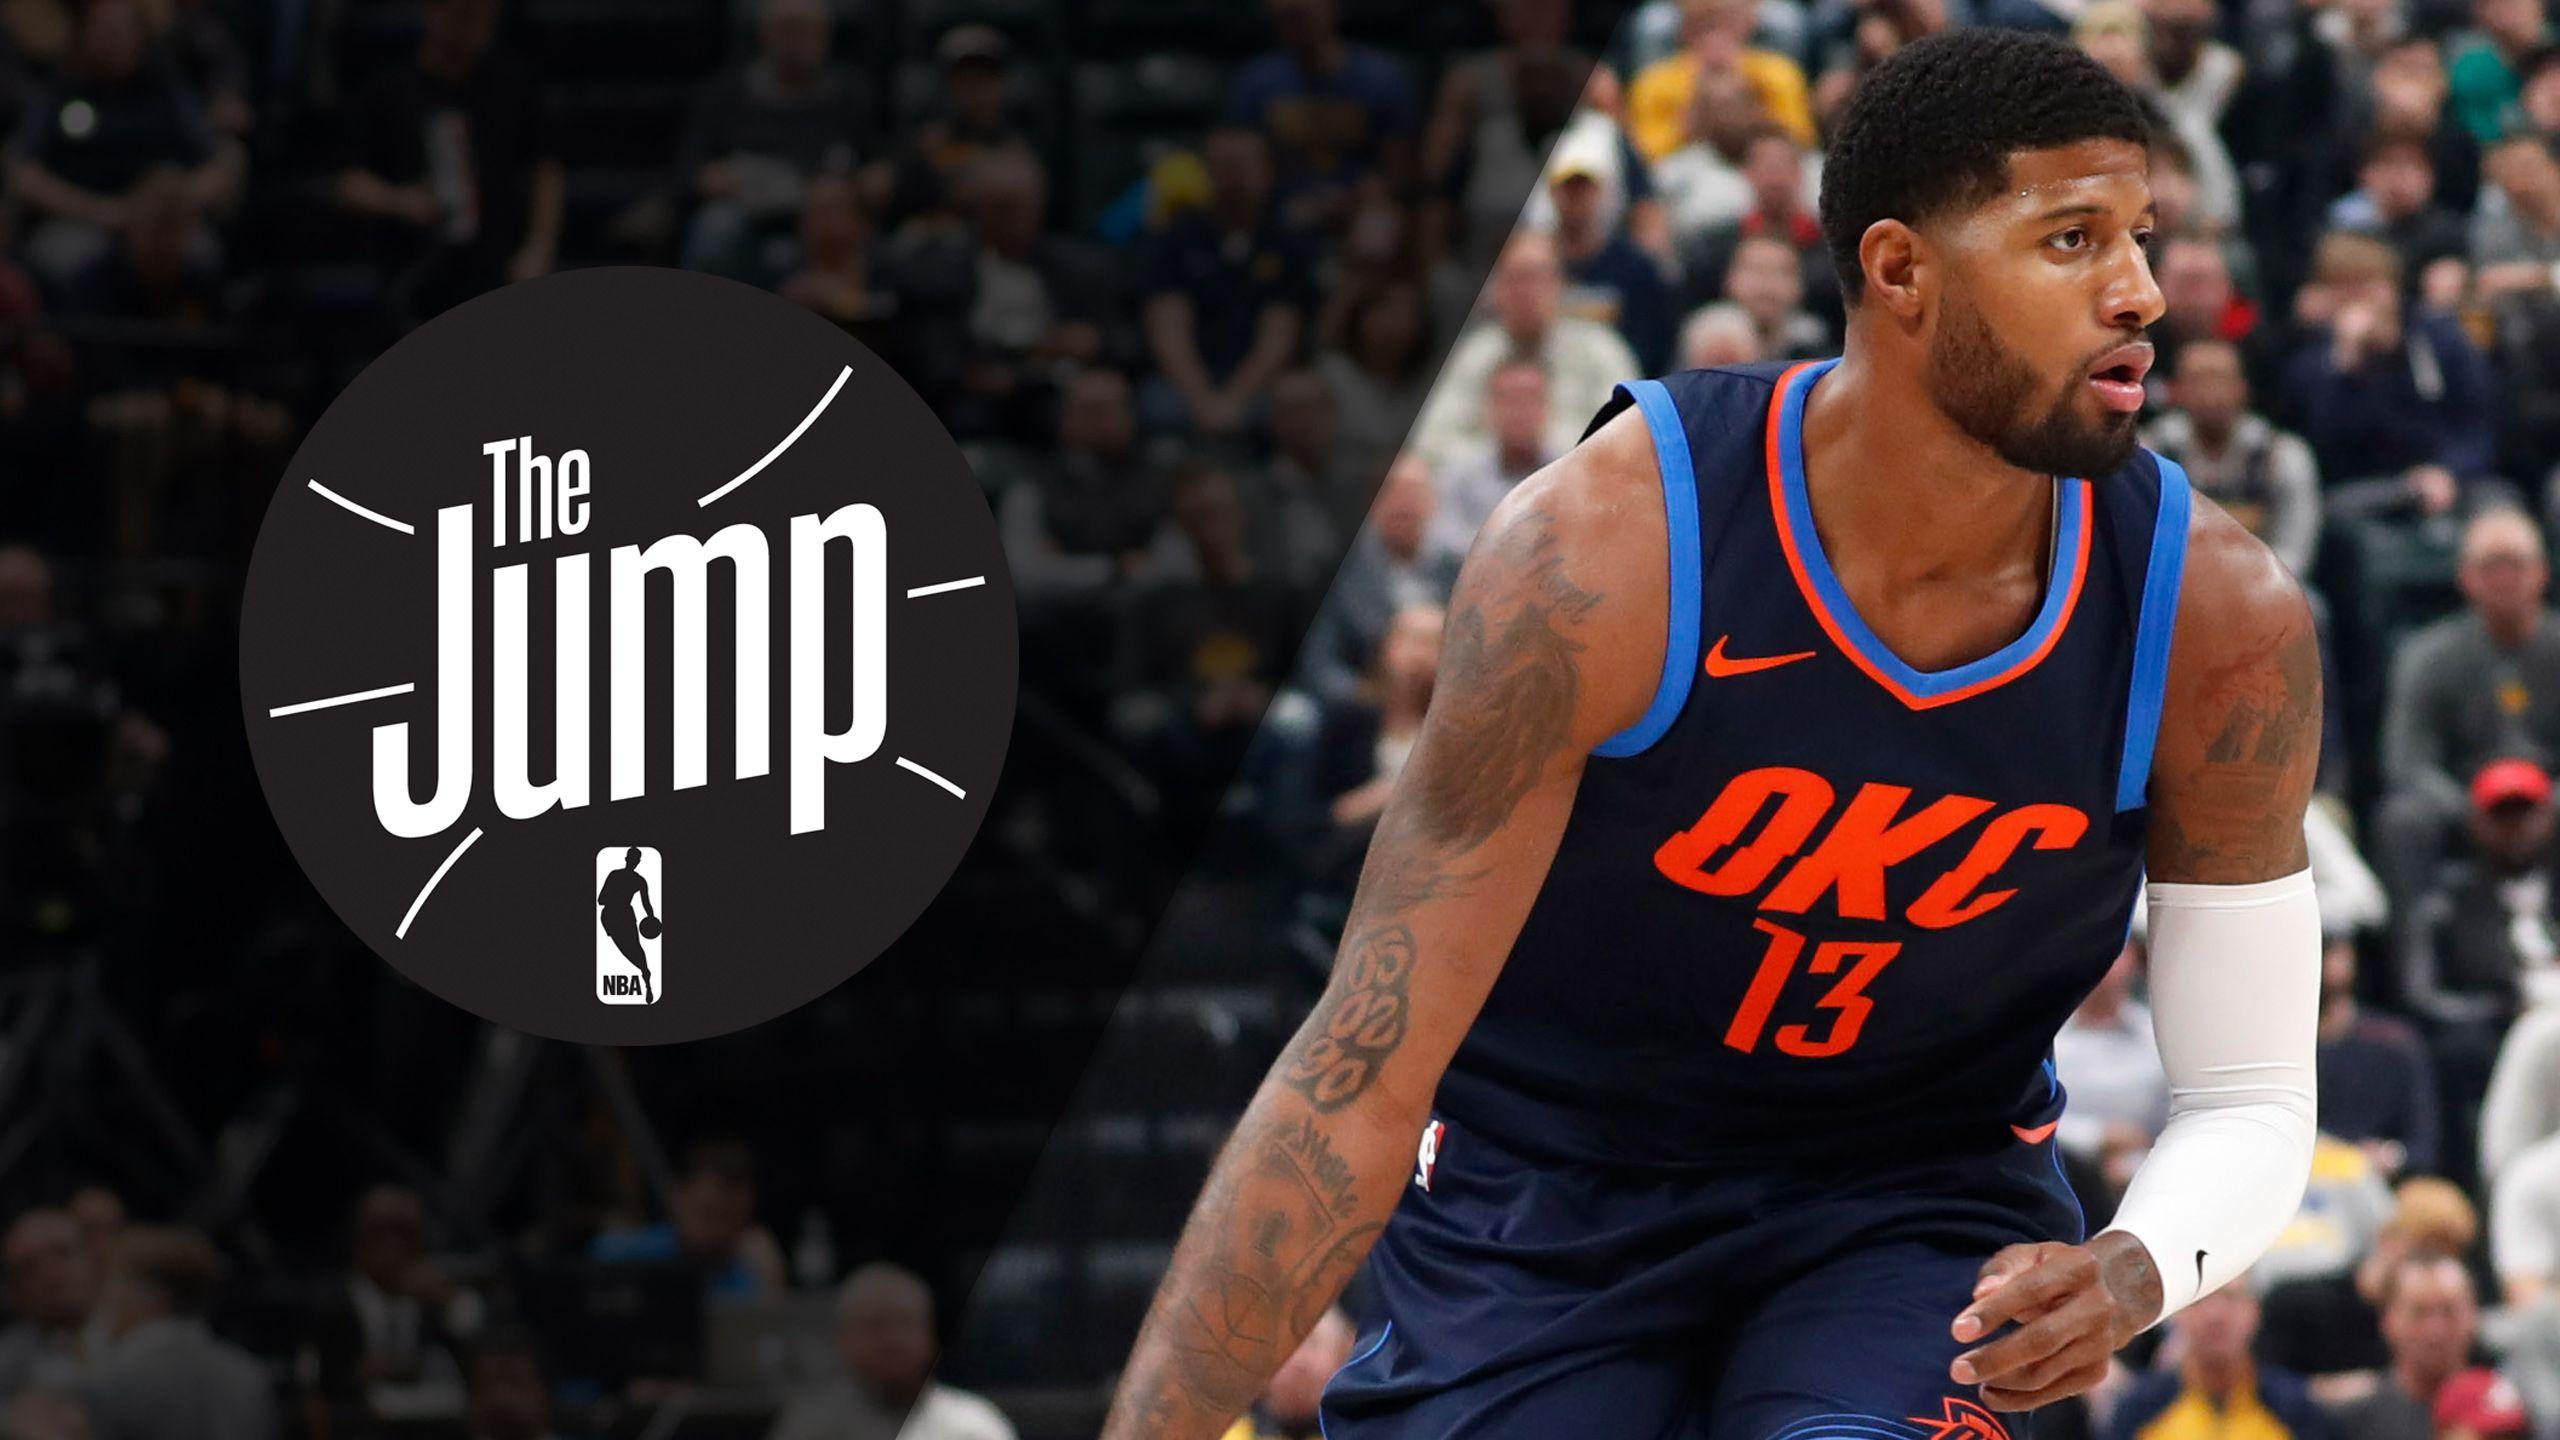 Thu, 12/14 - NBA: The Jump